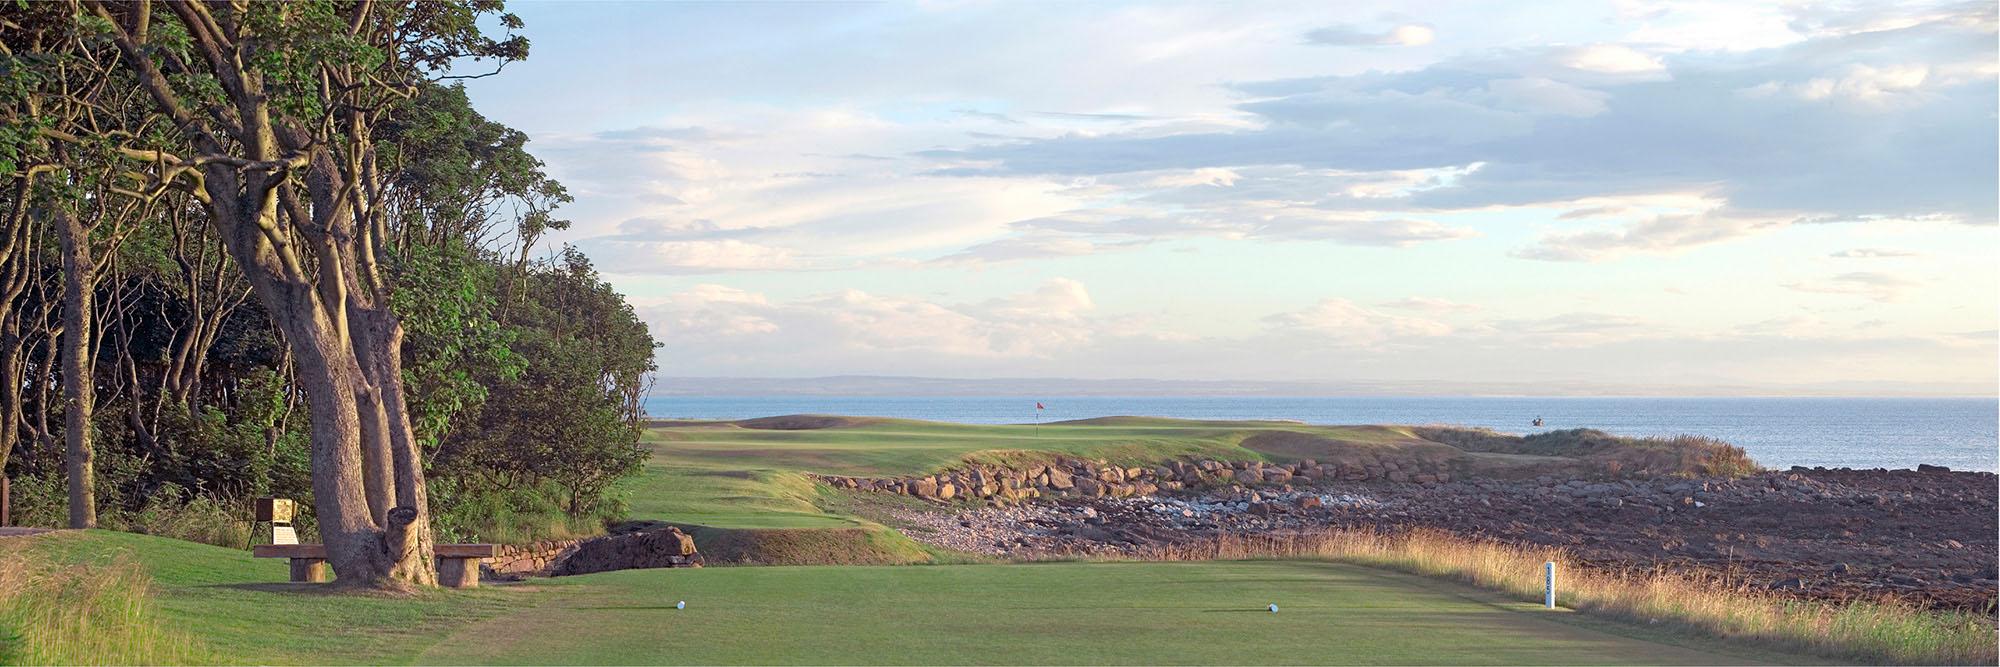 Golf Course Image - Kingsbarns No. 15